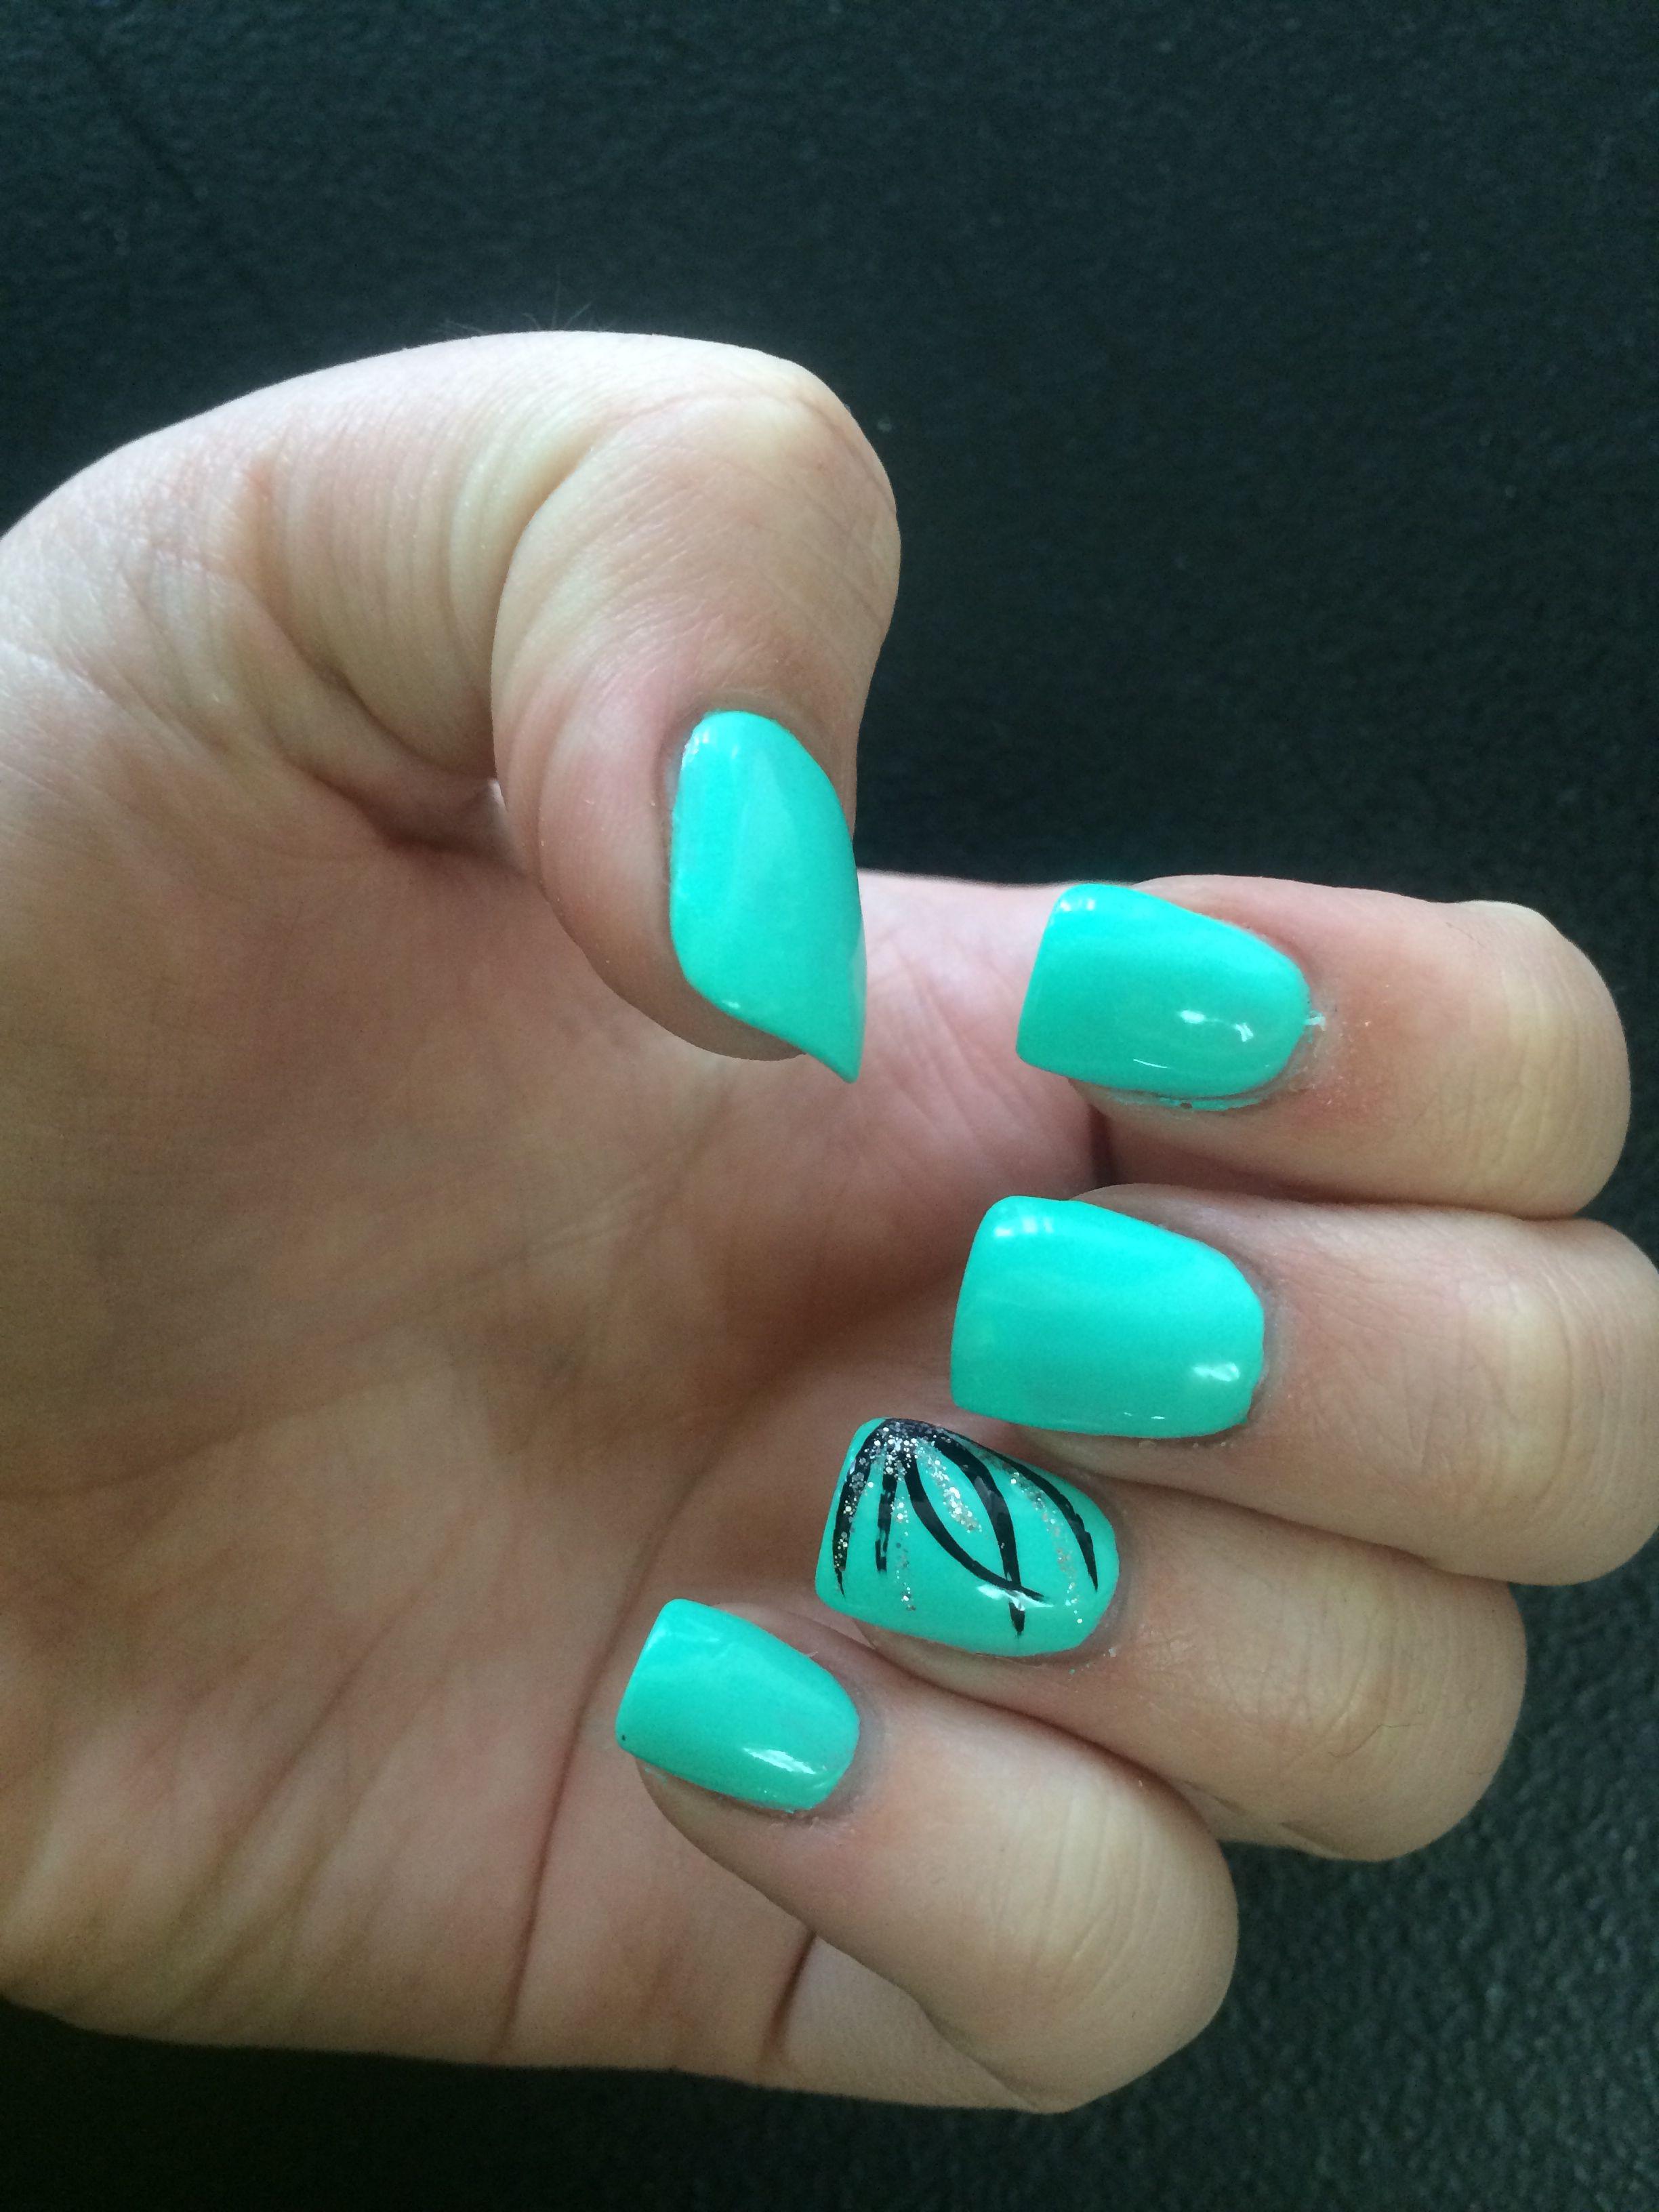 Spring break nails 2014 | Nails | Pinterest | Nails 2014 ...